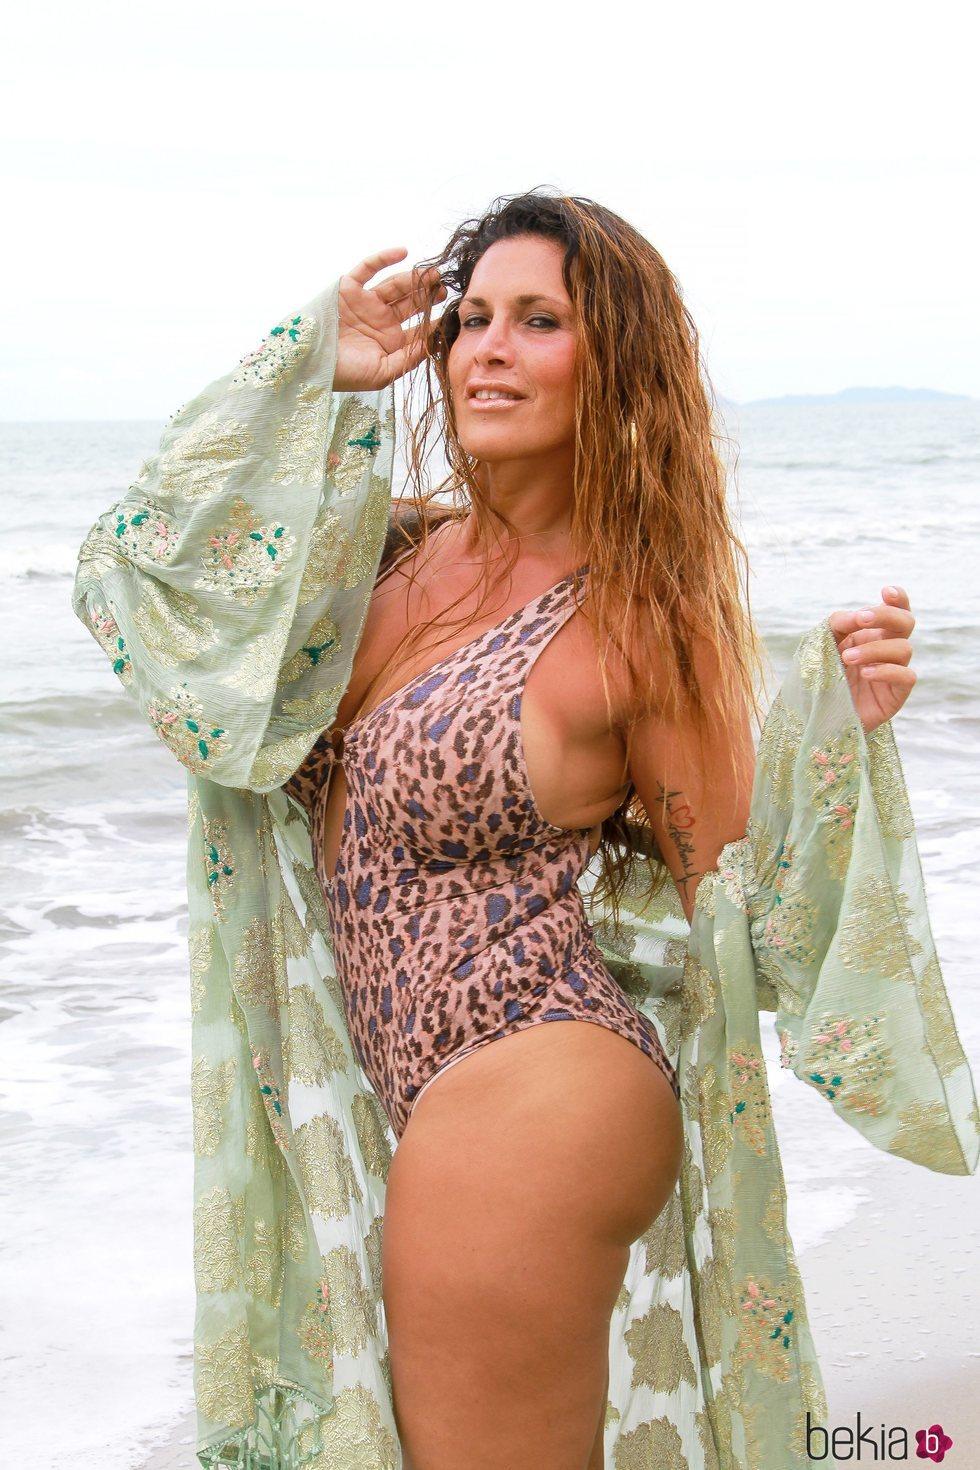 Lara Sajen posa en la playa en 'Supervivientes 2021'